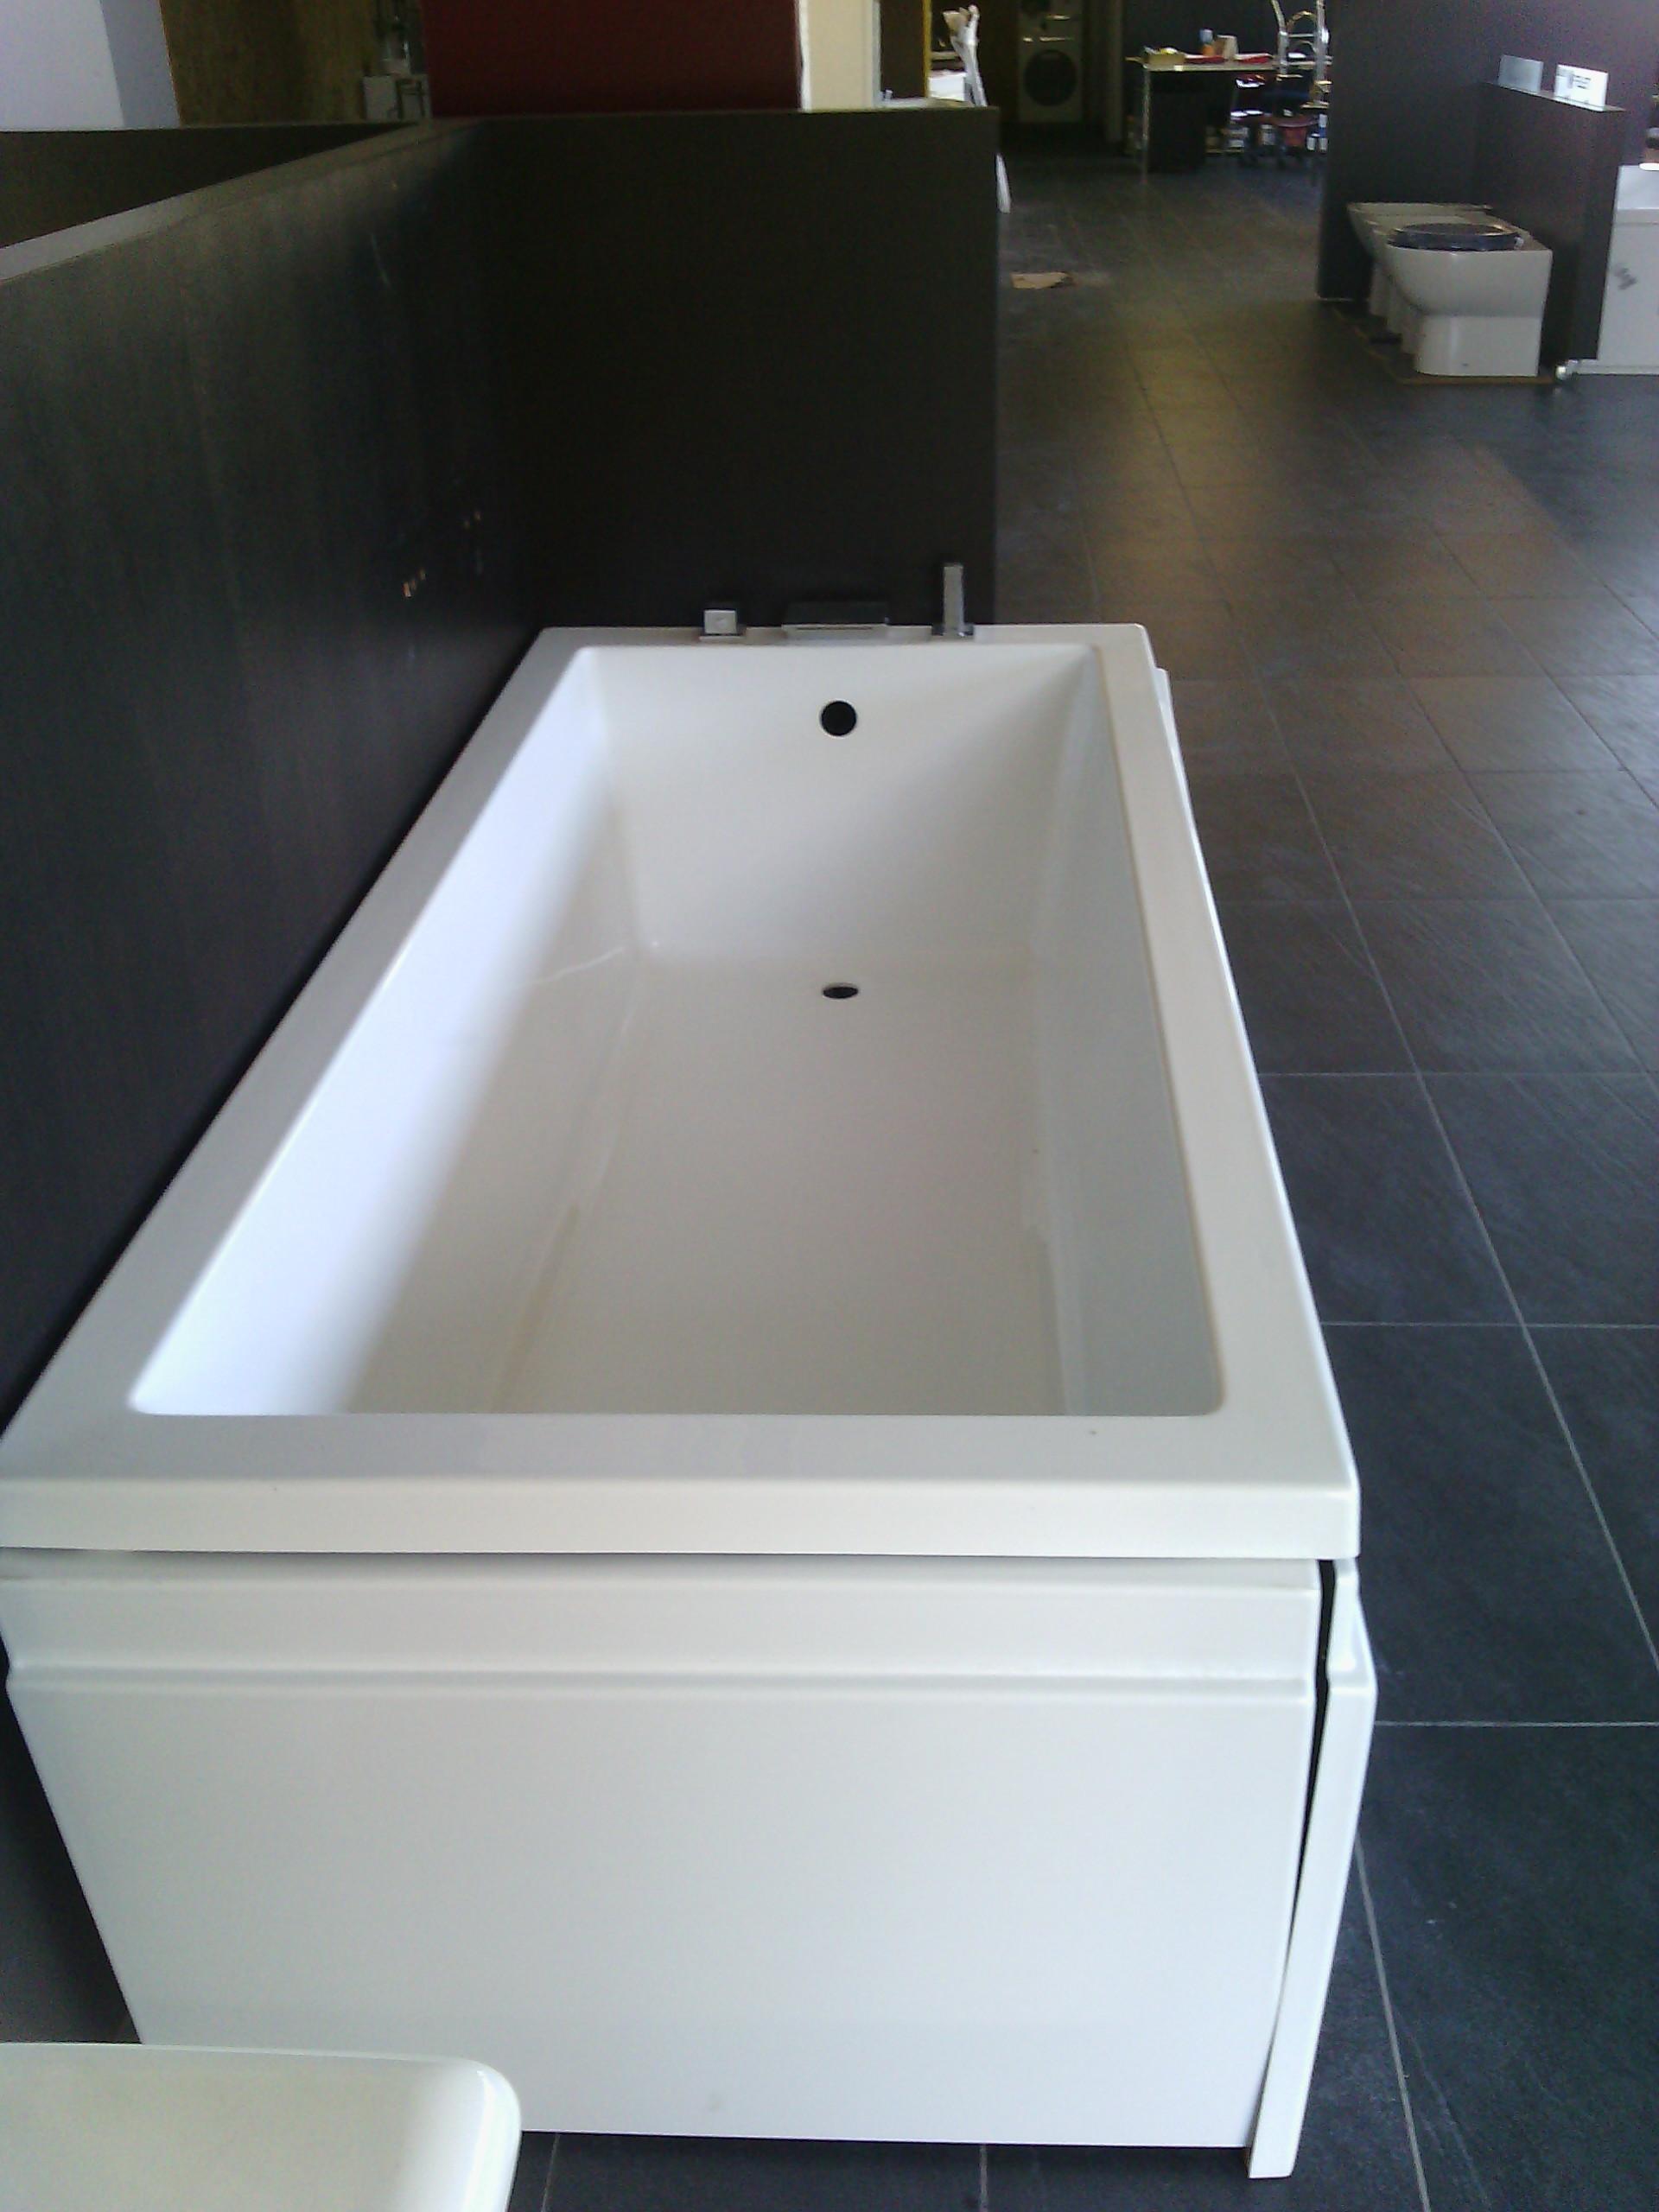 offerta vasca novellini calos scontata del 50% - arredo bagno a ... - Arredo Bagno Novellini